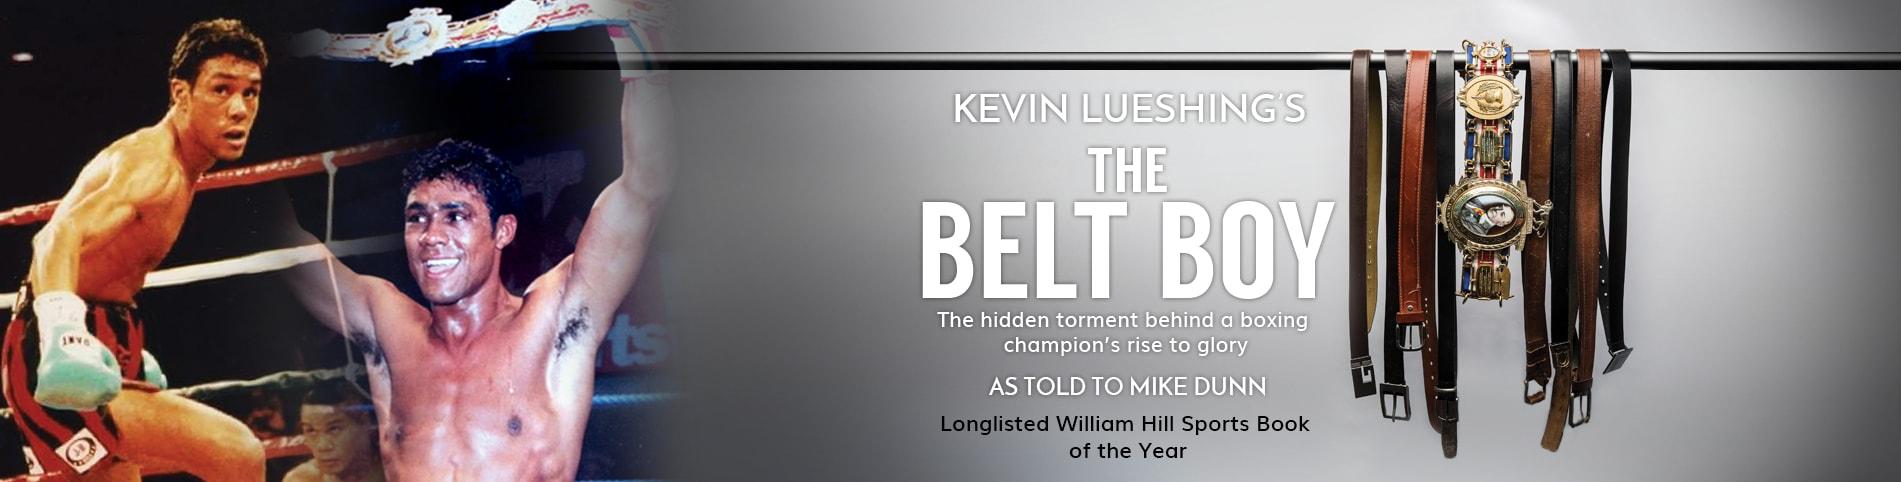 Belt boy